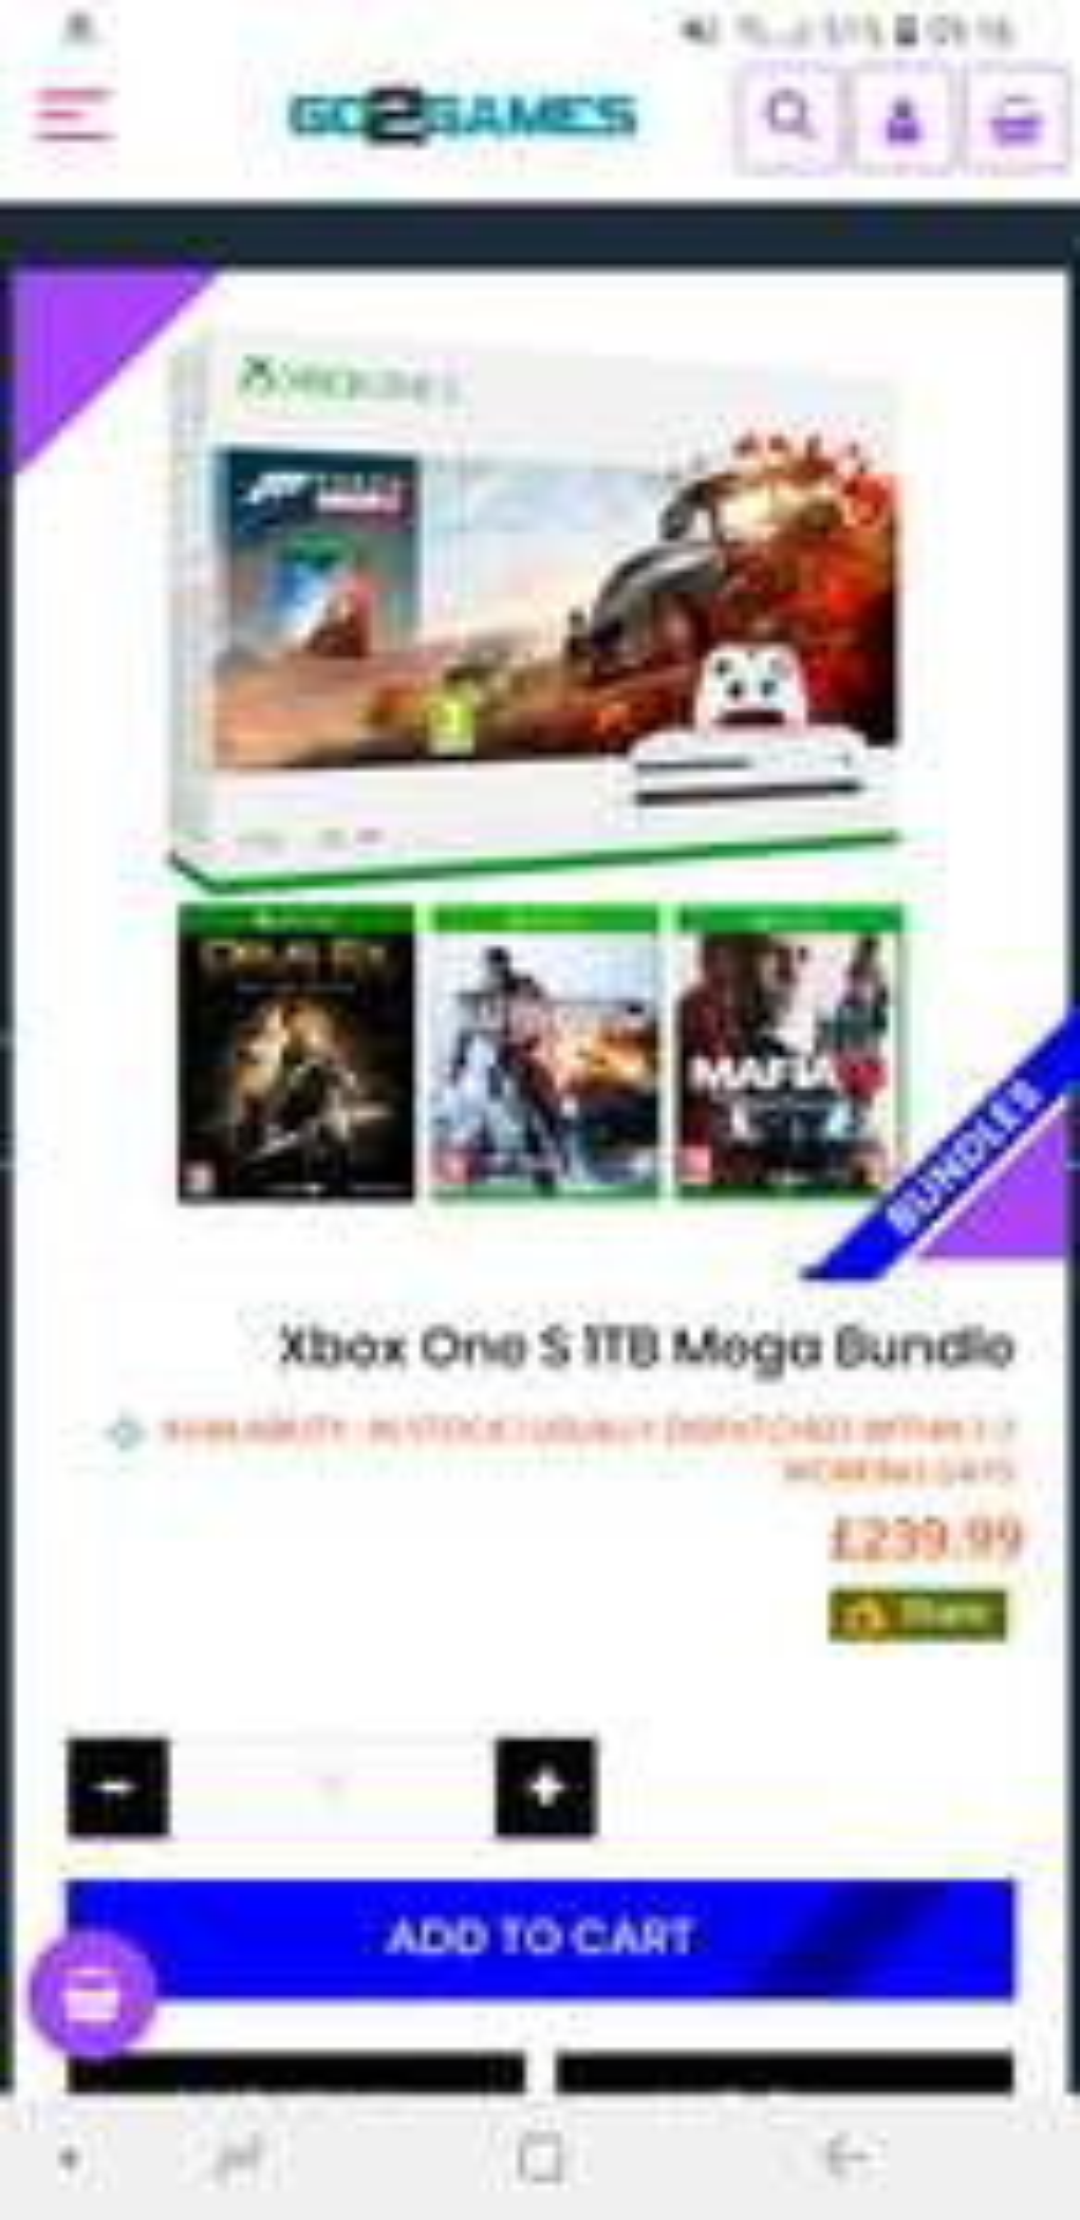 Xbox One S 1TB Mega Bundle with Forza Horizon 4, Battlefield 4, Mafia 3 & Deus Ex Mankind £239.99 @ Go2games